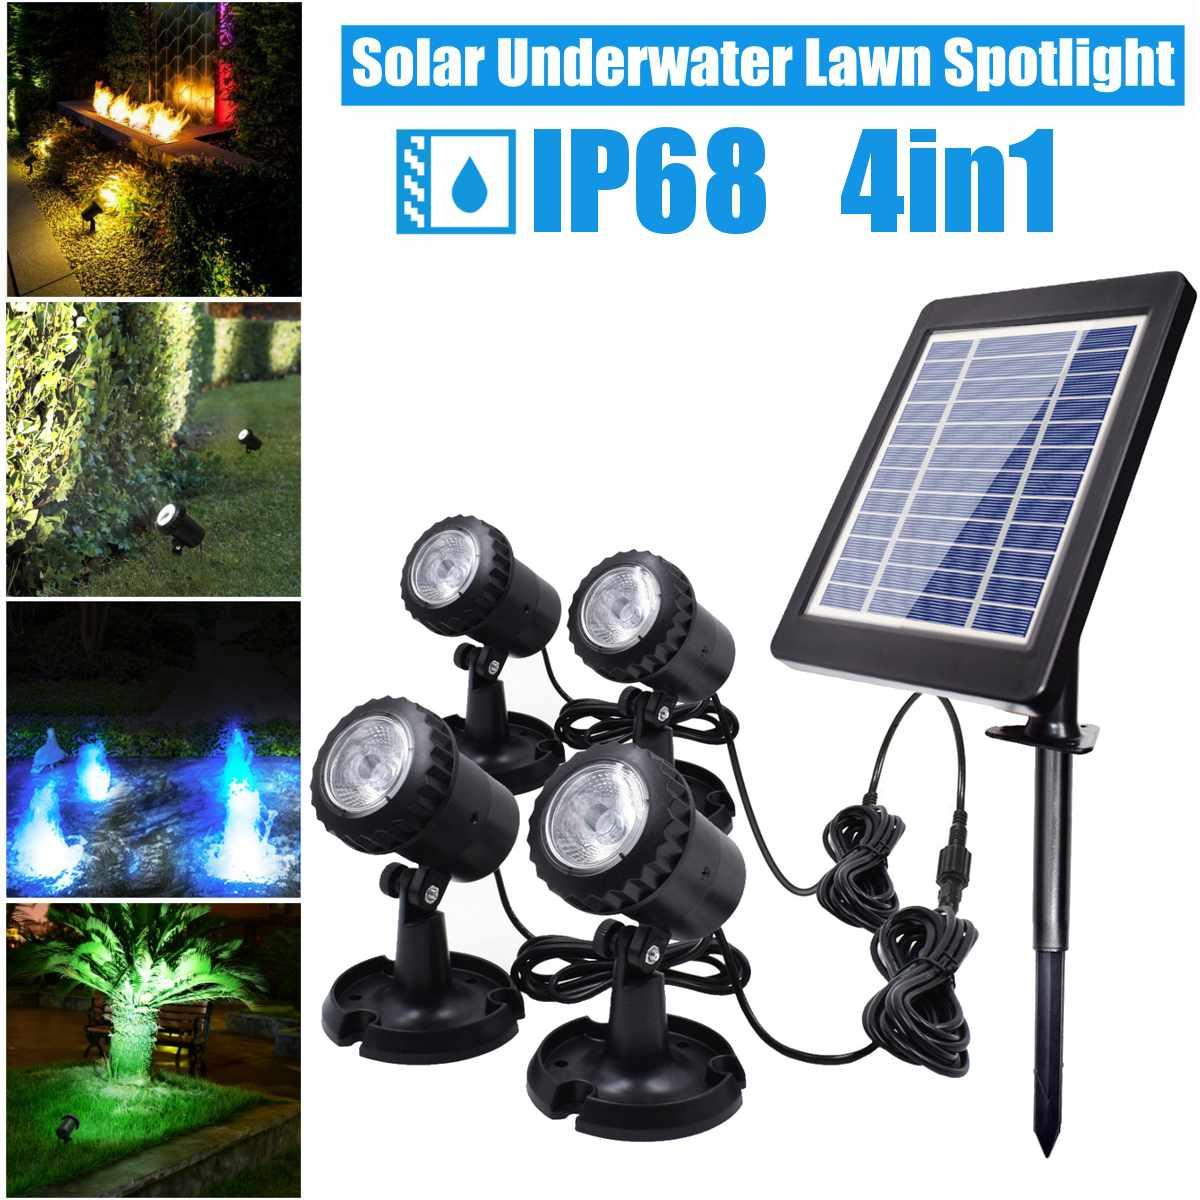 Solar Light 1 In 4 Waterproof IP68 Underwater Fountain Pond Lights LED Spotlights For Outdoor Amphibious Lawn Pool Garden